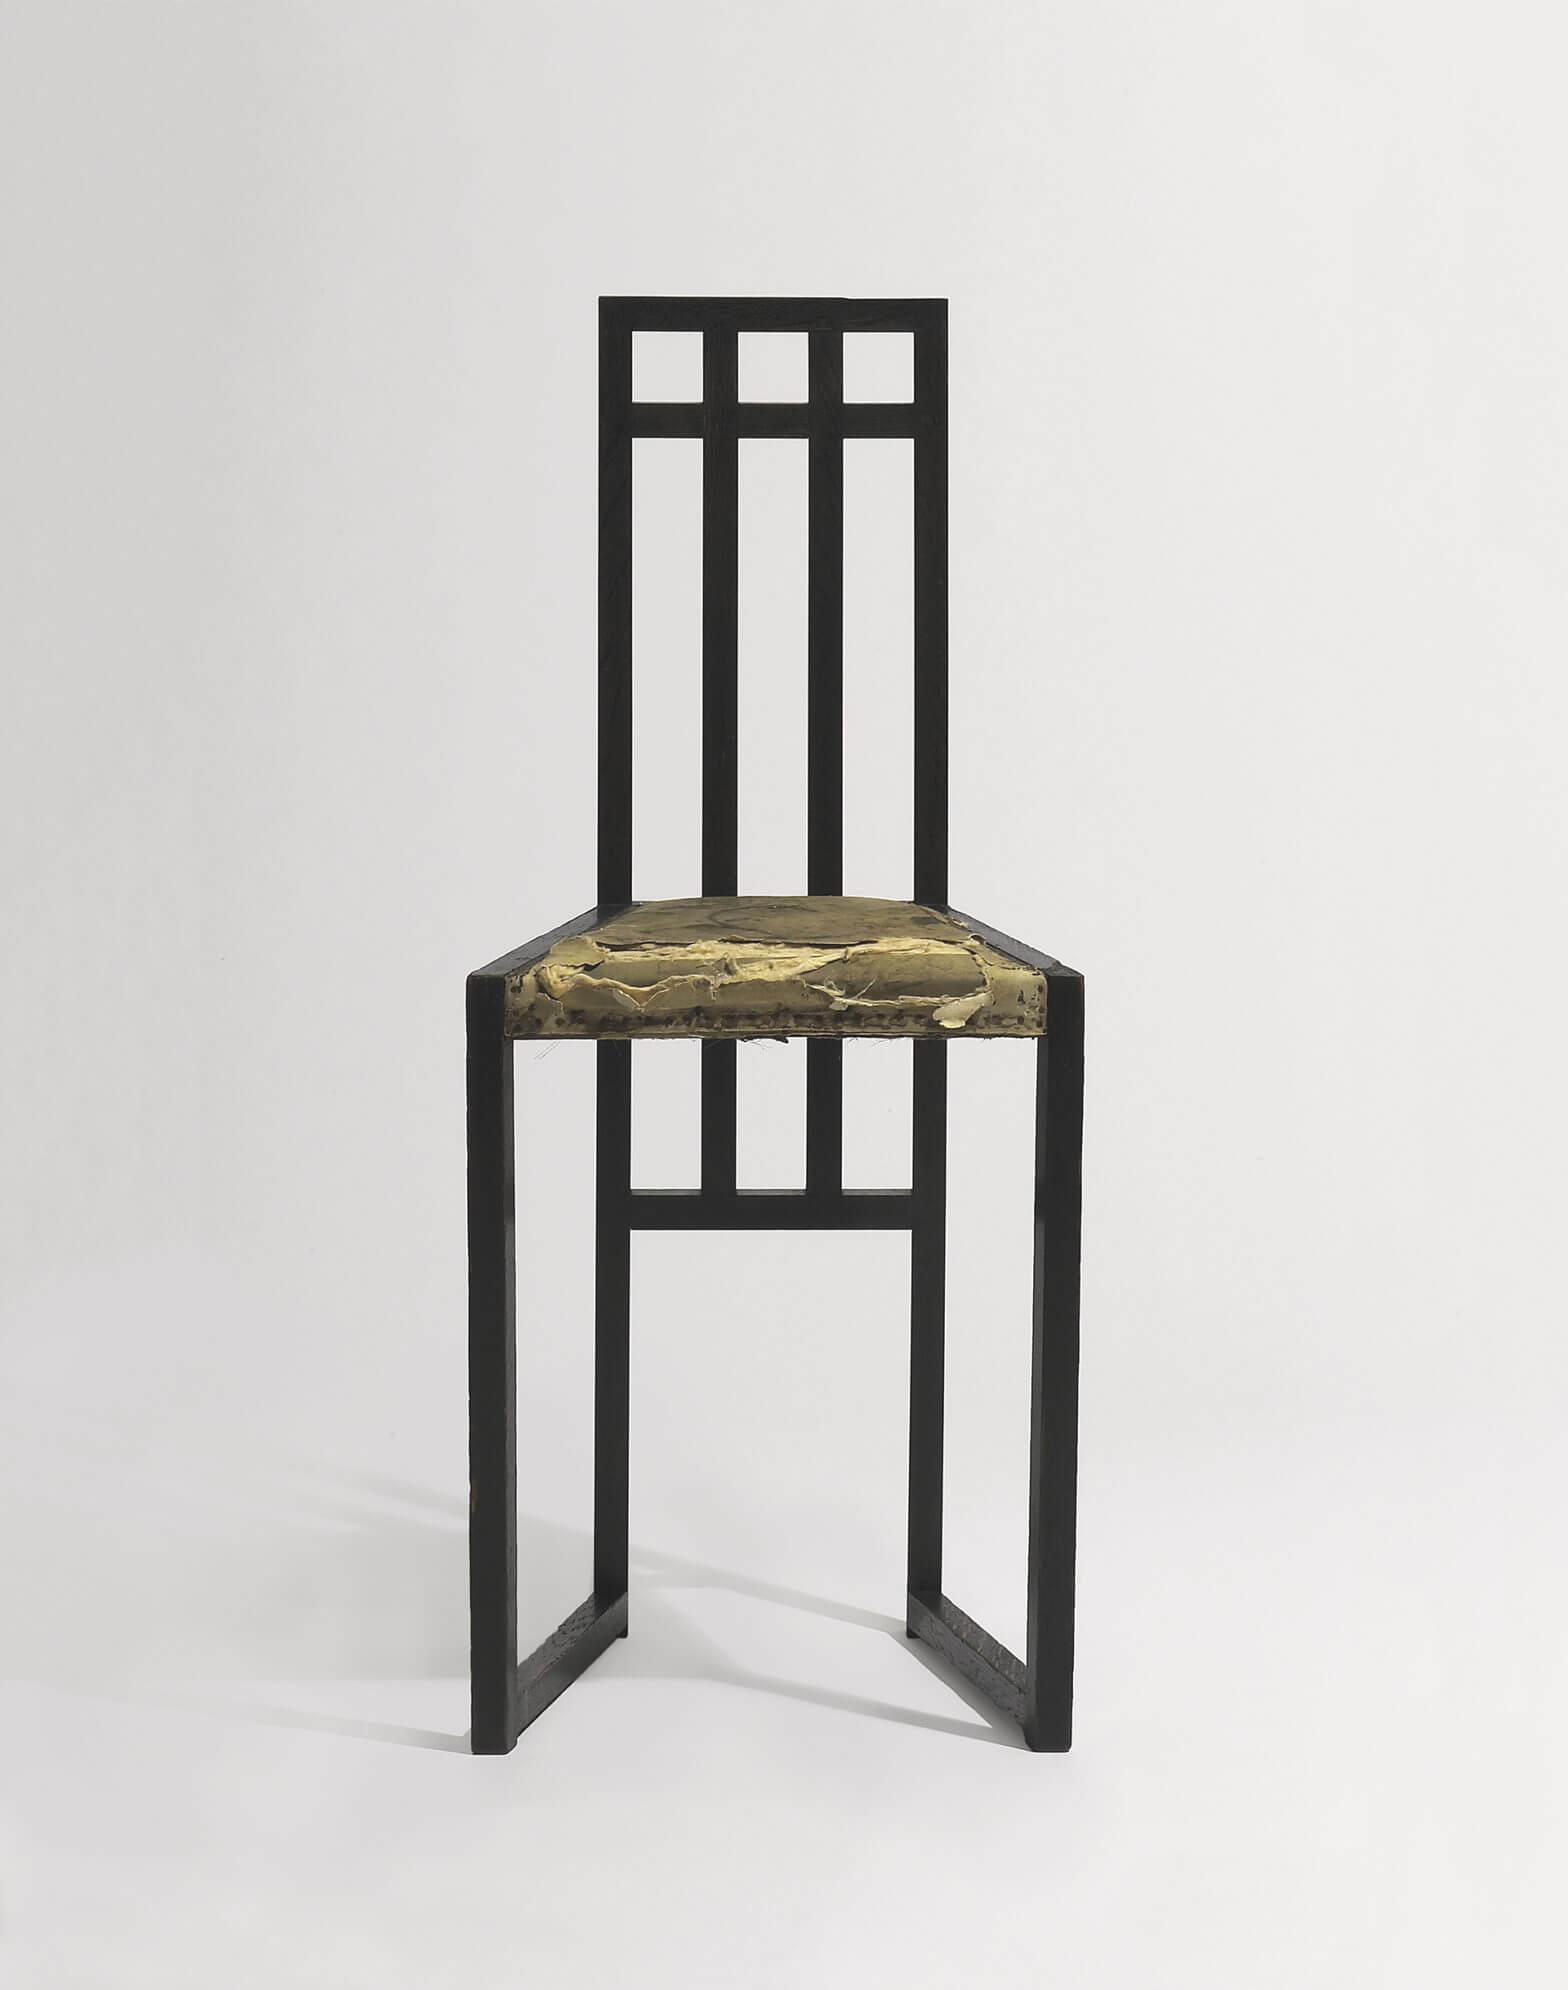 Josef Hoffmann - Side chair for the premises of the Wiener Werkstätte